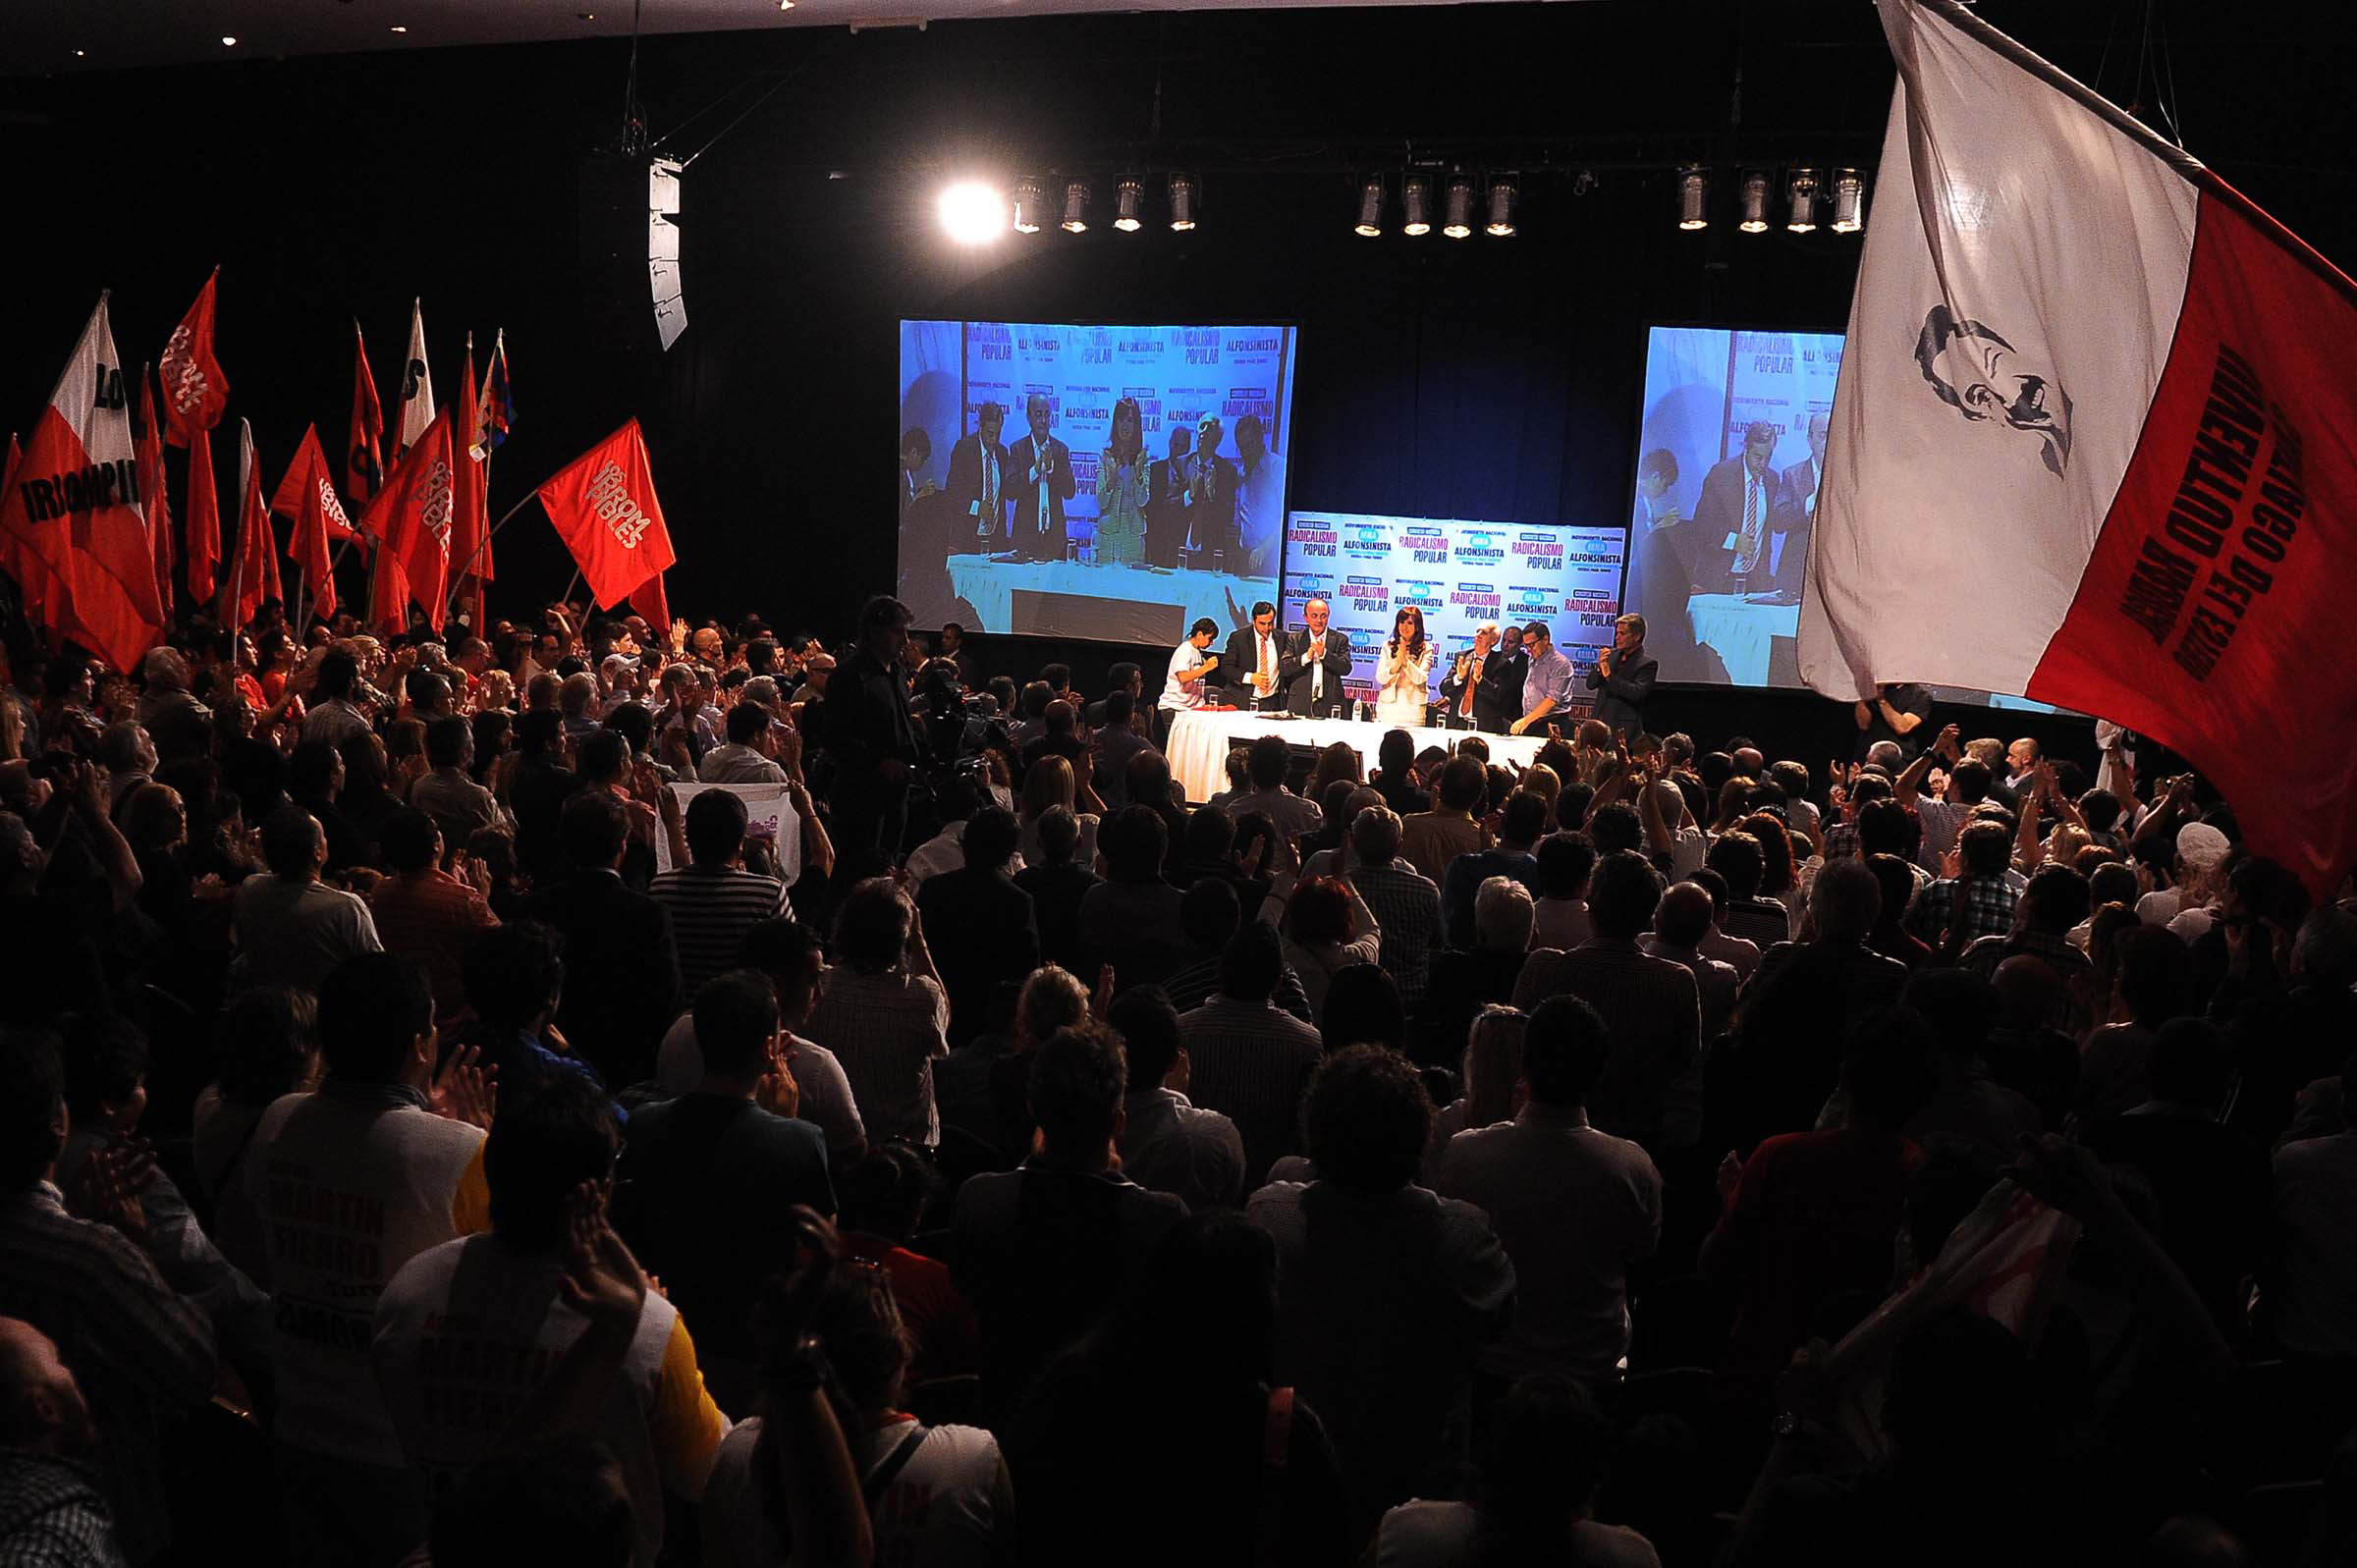 17-04-2015_buenos_aires_la_presidenta_cristina (8)